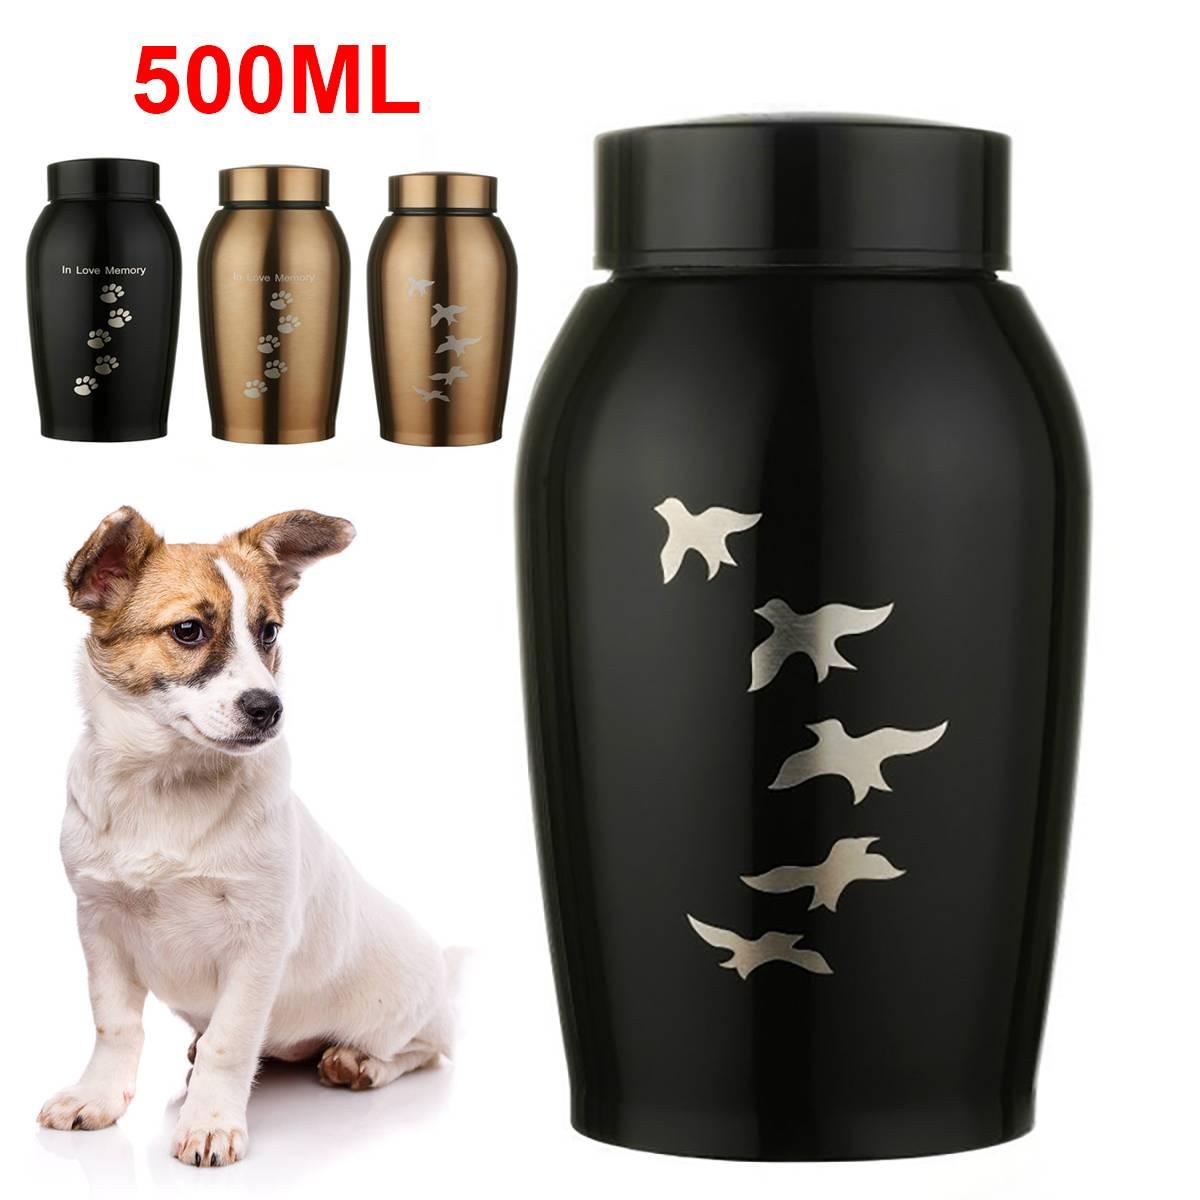 Gold/Black Stainless Steel Urns Pets Dog Cat Birds Mouse Cremation Ashes Urn Keepsake Casket Columbarium Pets Memorials